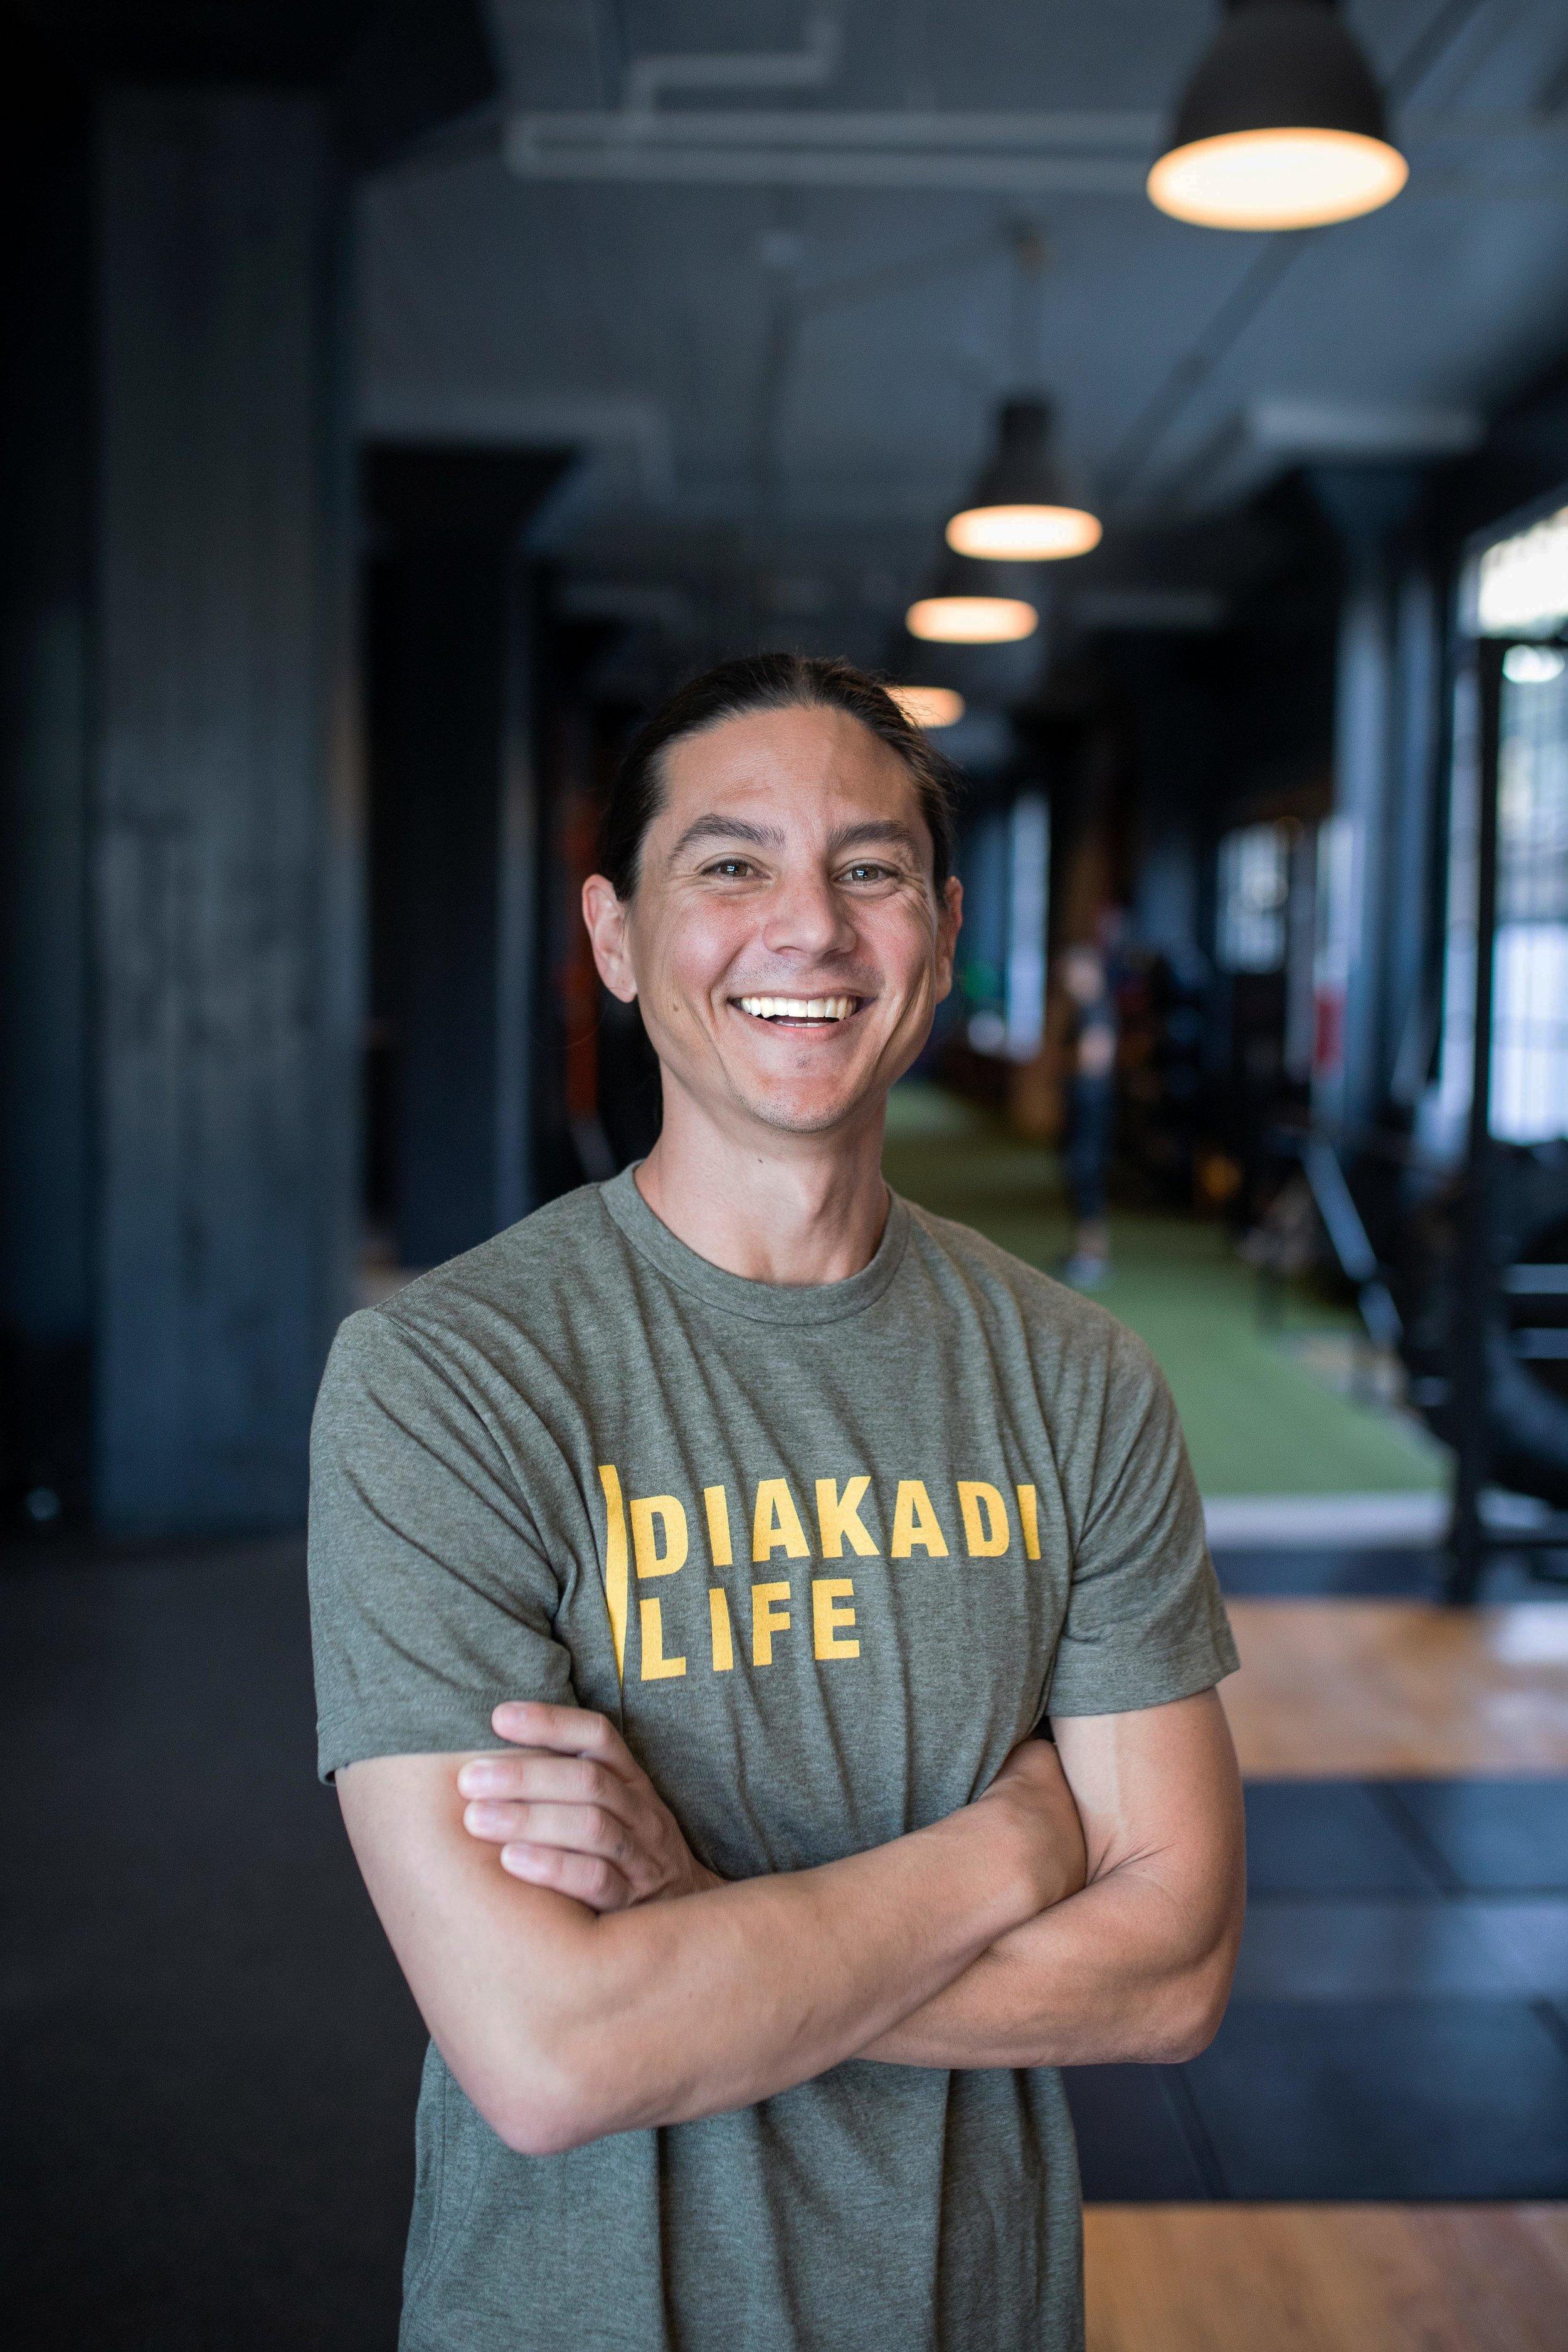 Nate Miyaki Bodybuilder Physique Focus Training copy.jpg